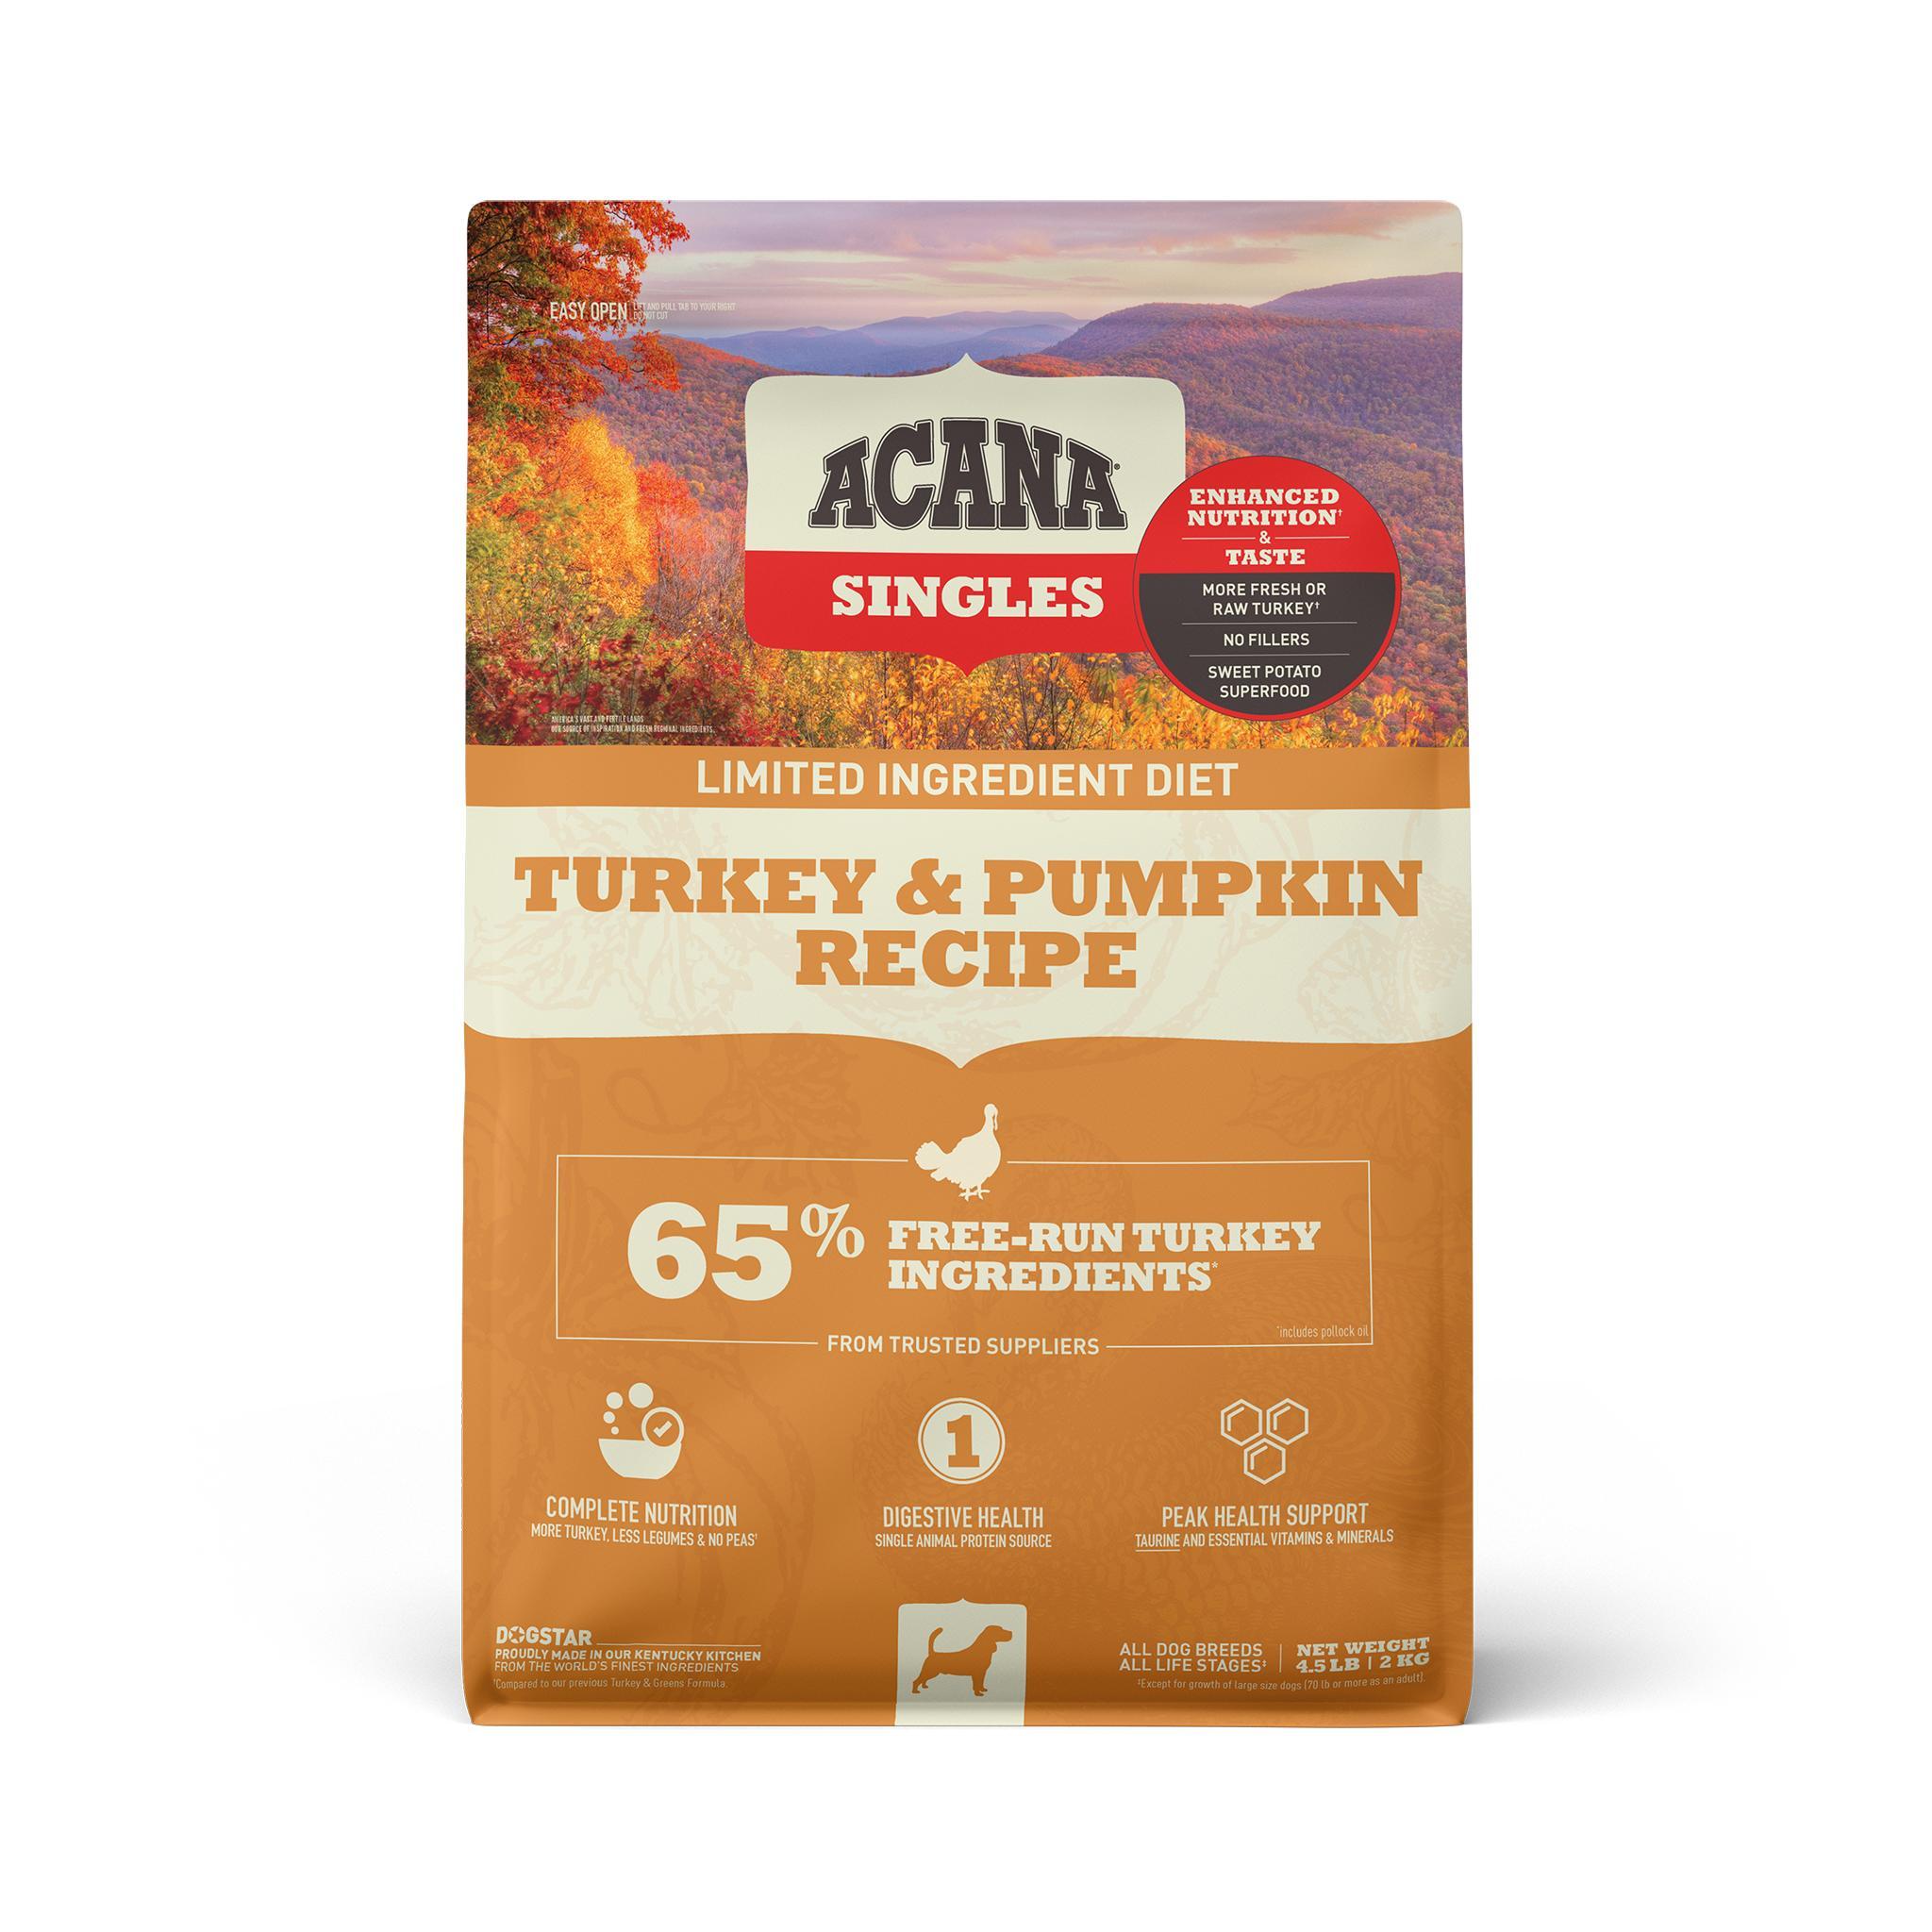 ACANA Singles Limited Ingredient Turkey & Pumpkin Grain-Free Dry Dog Food, 4.5-lb